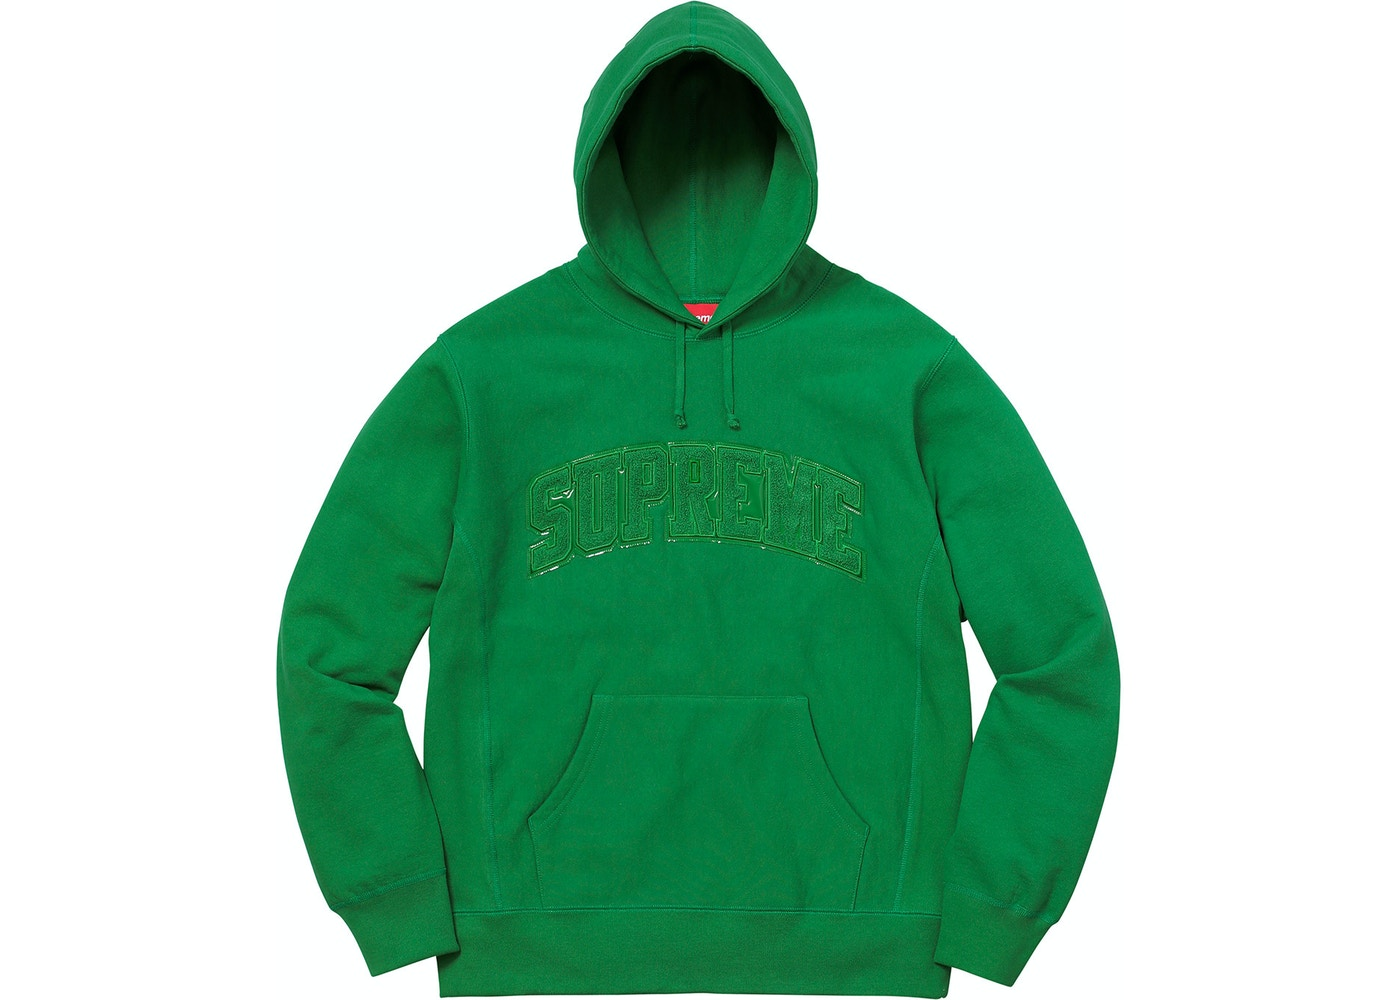 98ffda84 Supreme Patent/Chenille Arc Logo Hooded Sweatshirt Kelly Green —  HypeAnalyzer